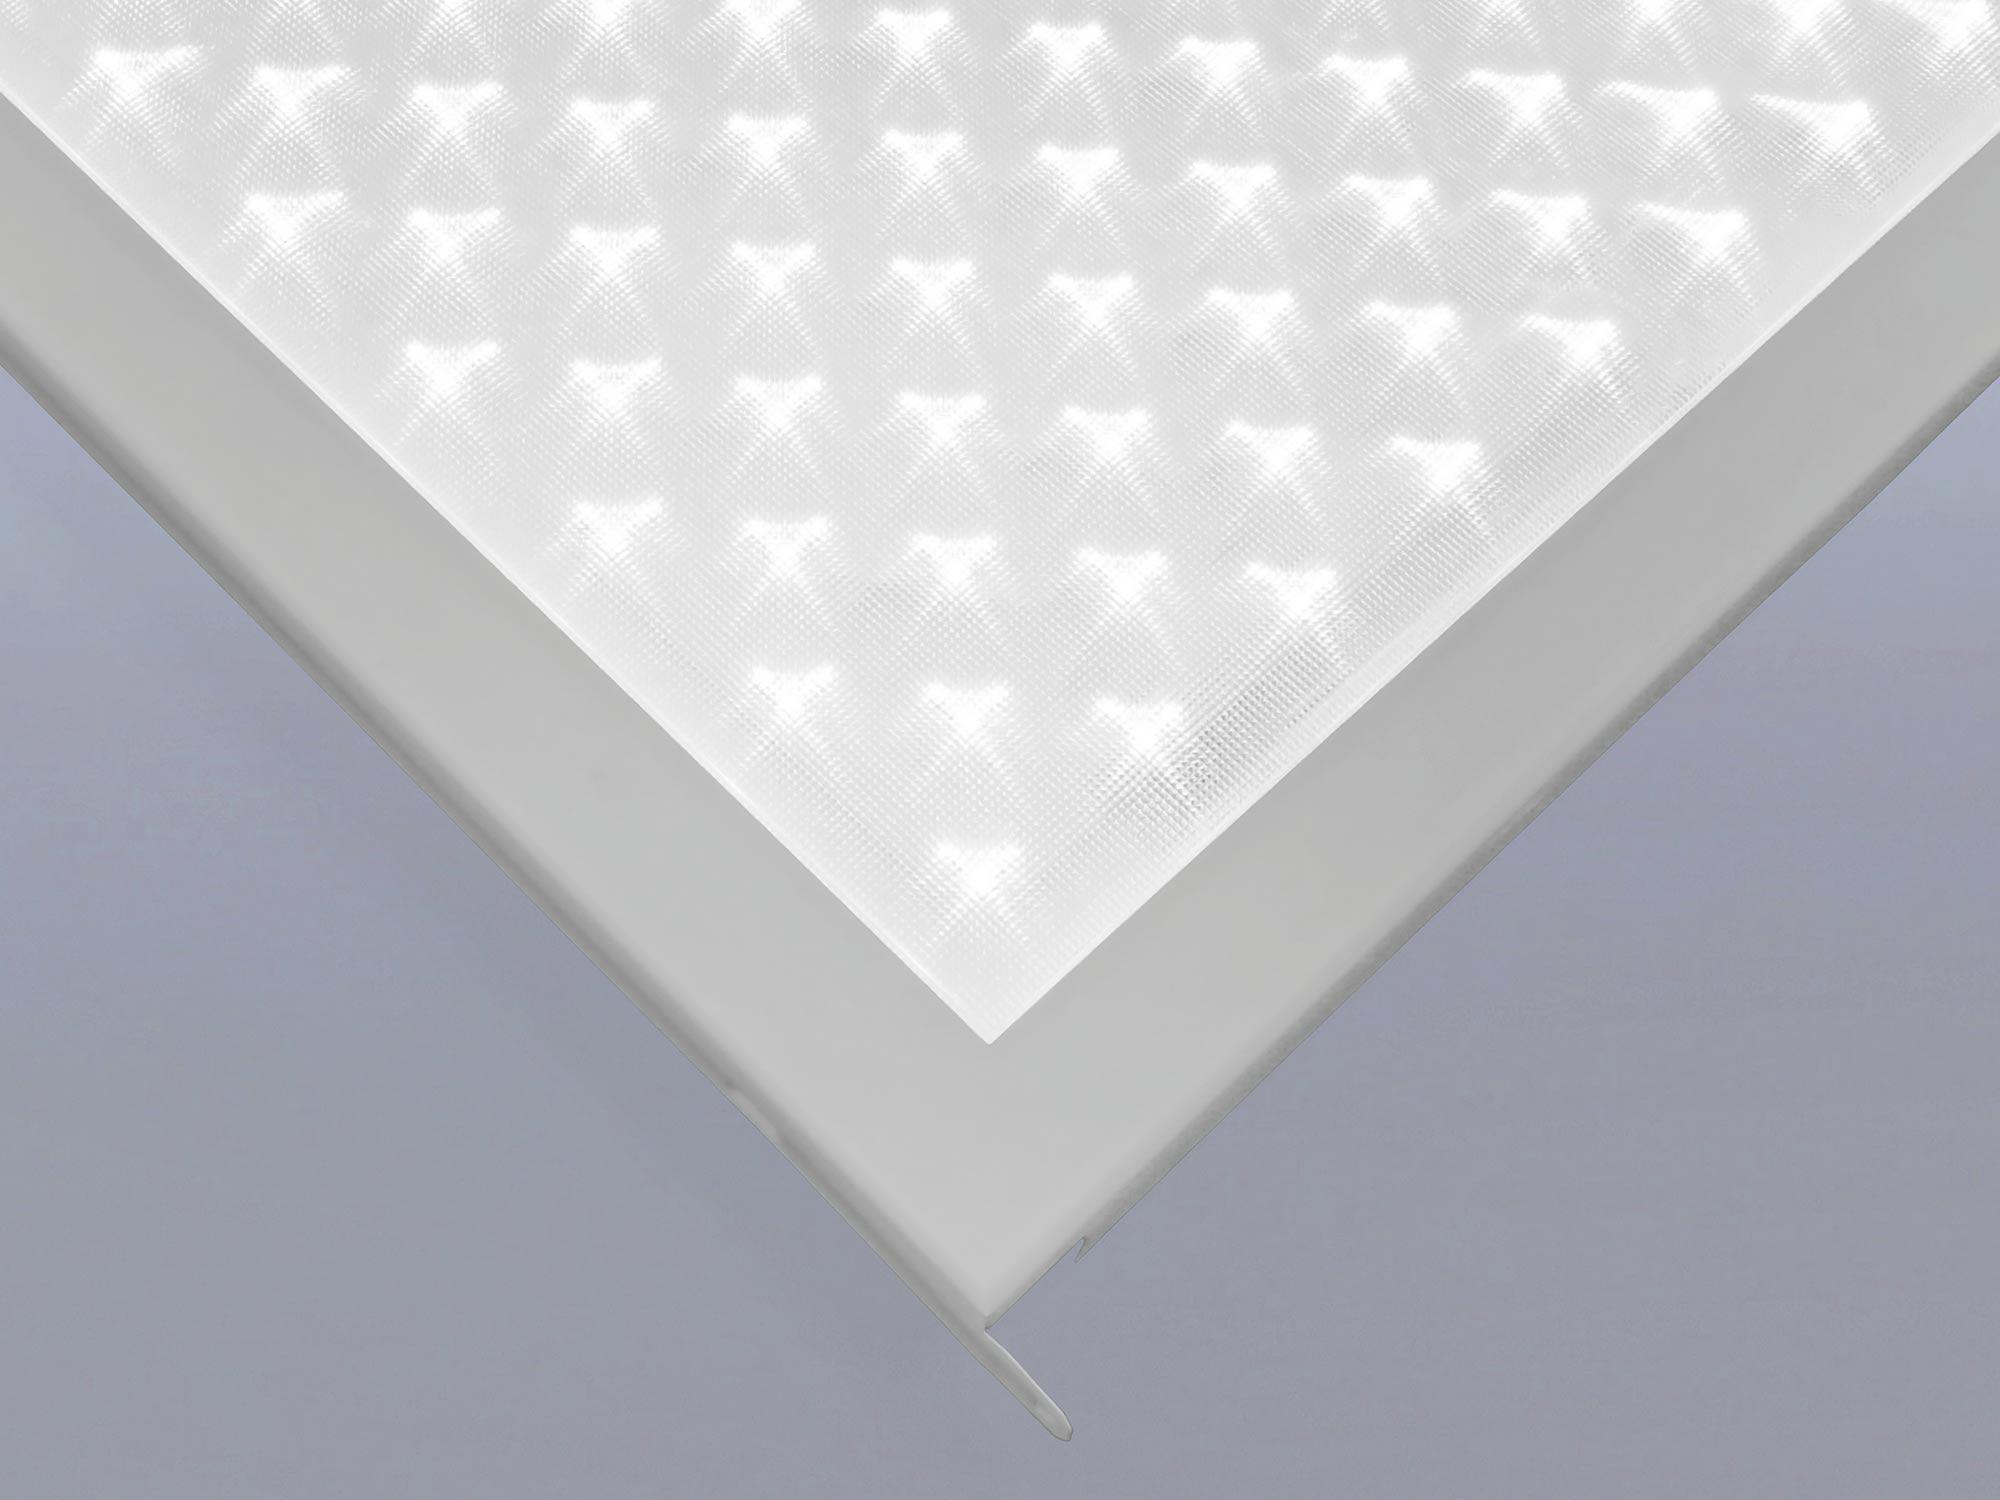 LED-Leuchte Klemm-Klapp Quattro-Line mit Mikro-Prismen-Abdeckung IP65Plus